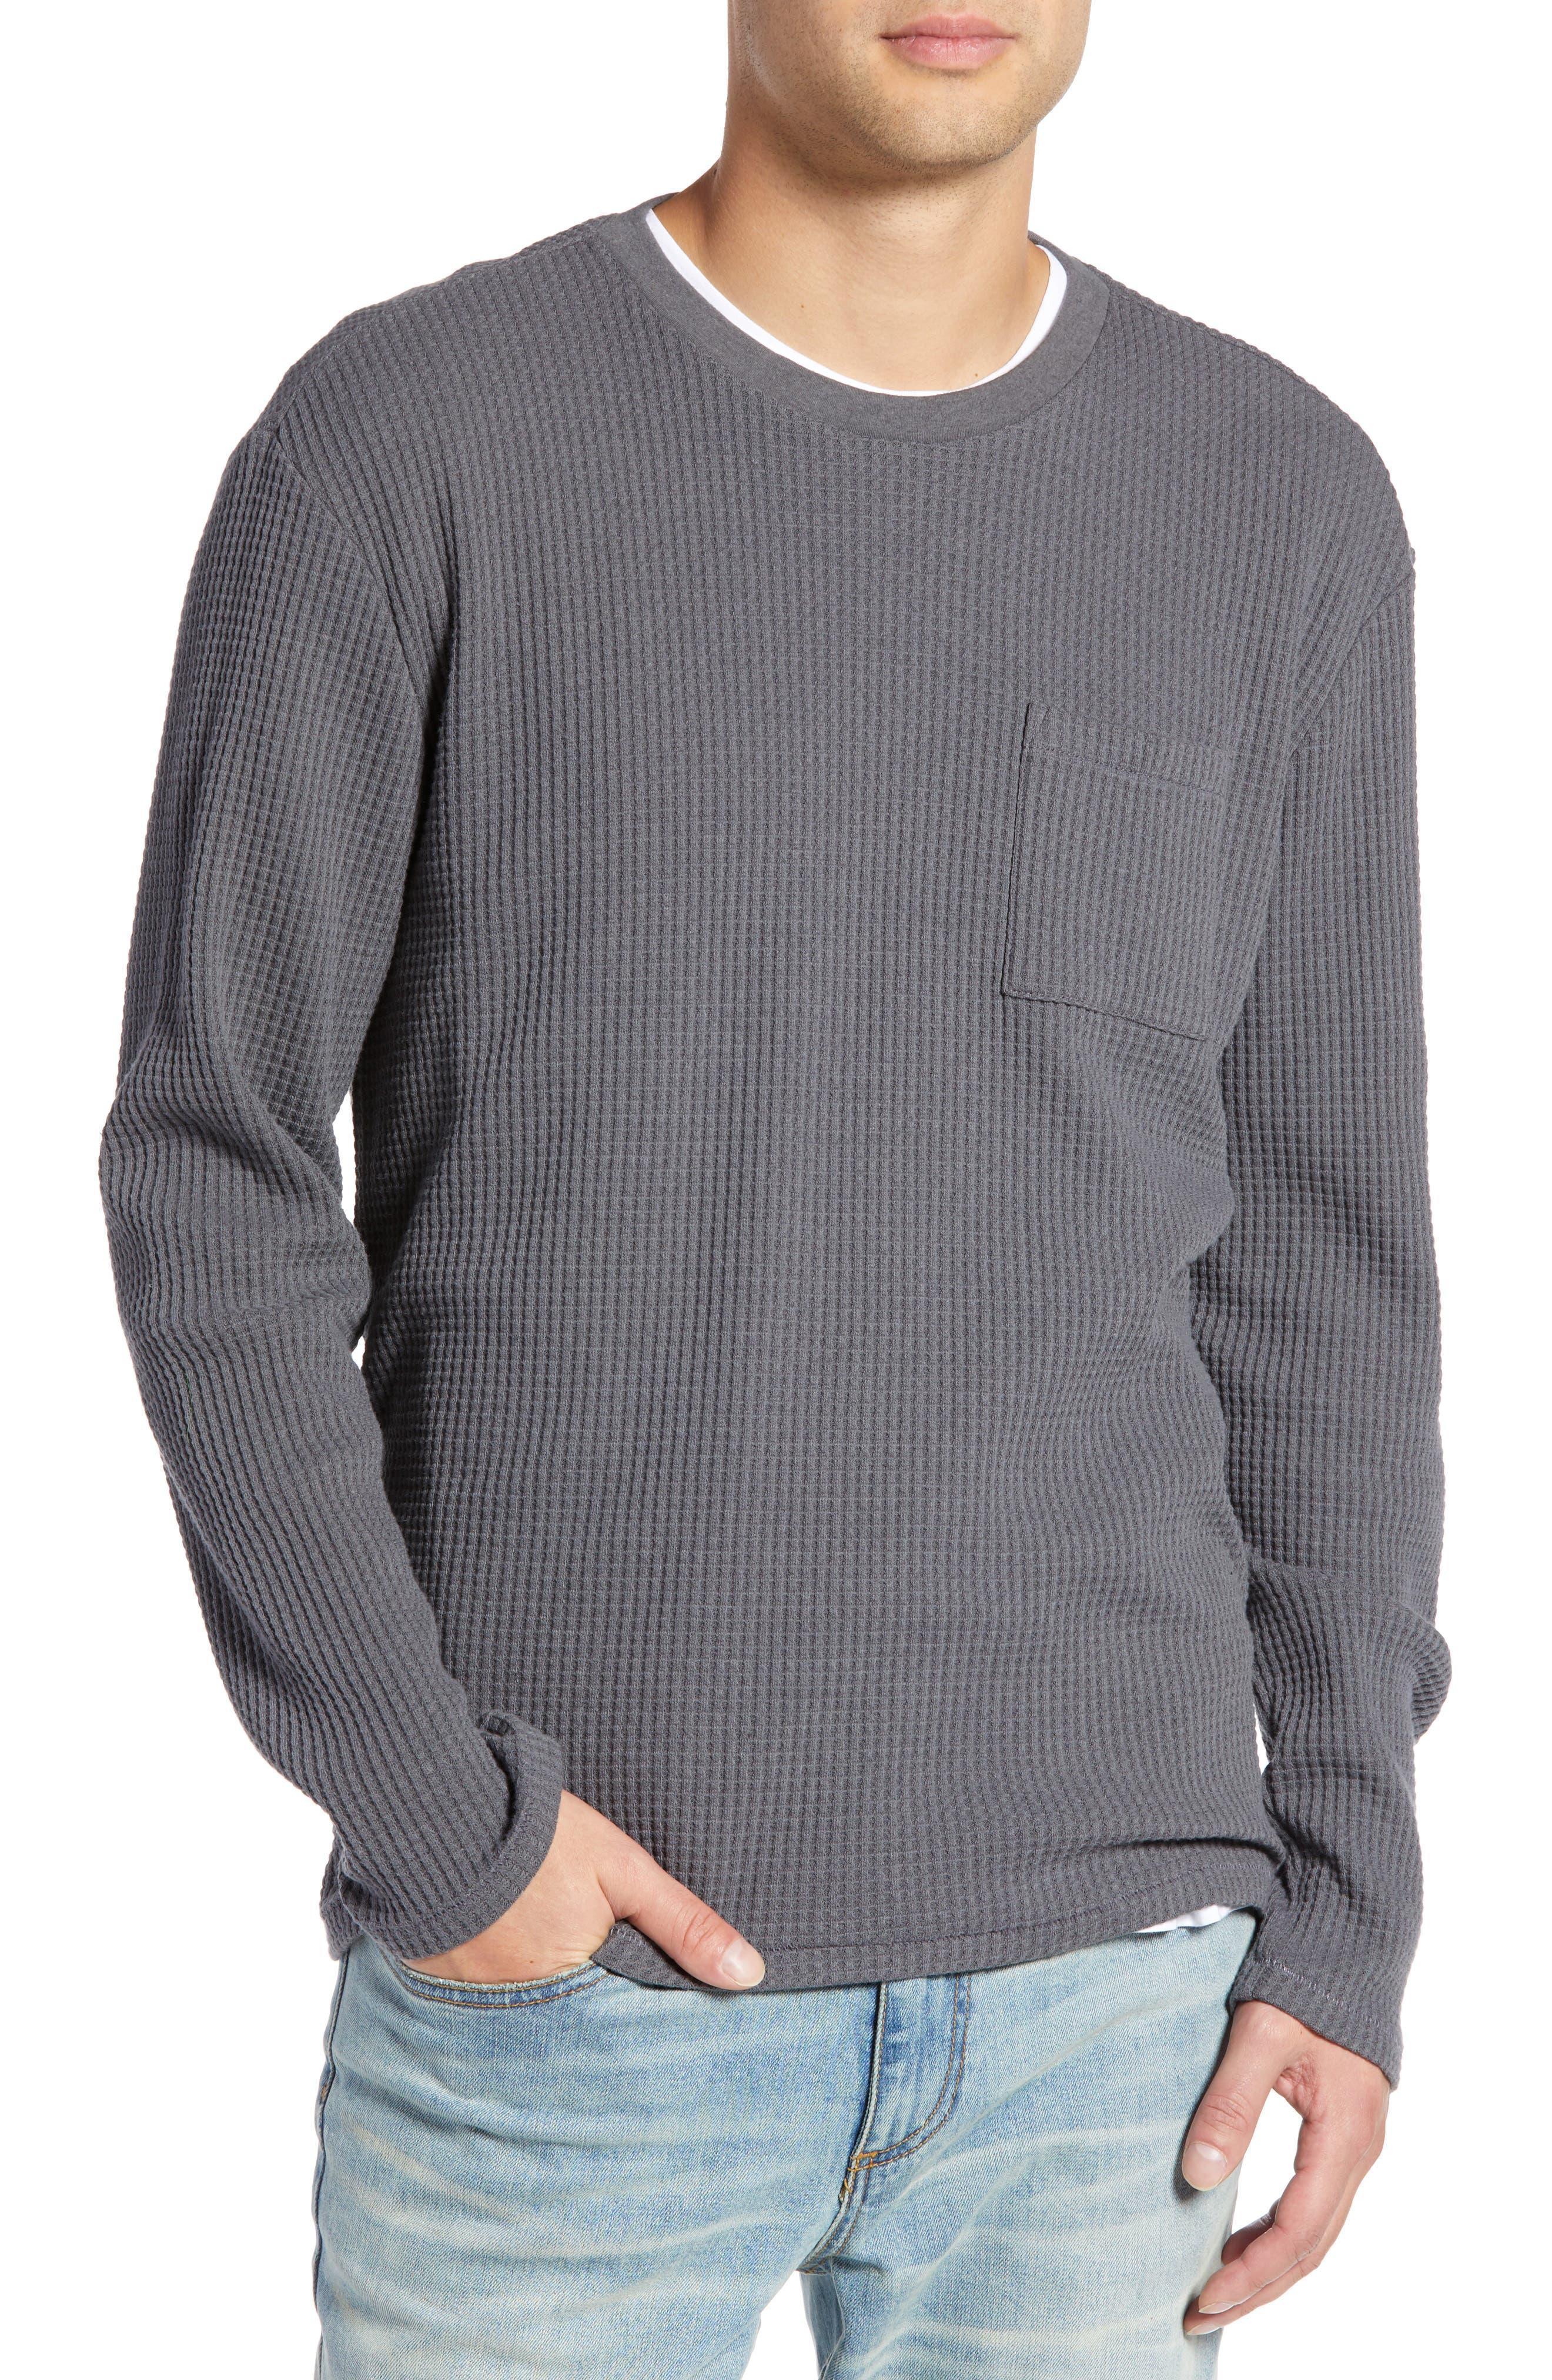 Regular Fit Thermal T-Shirt,                             Main thumbnail 1, color,                             GREY TORNADO